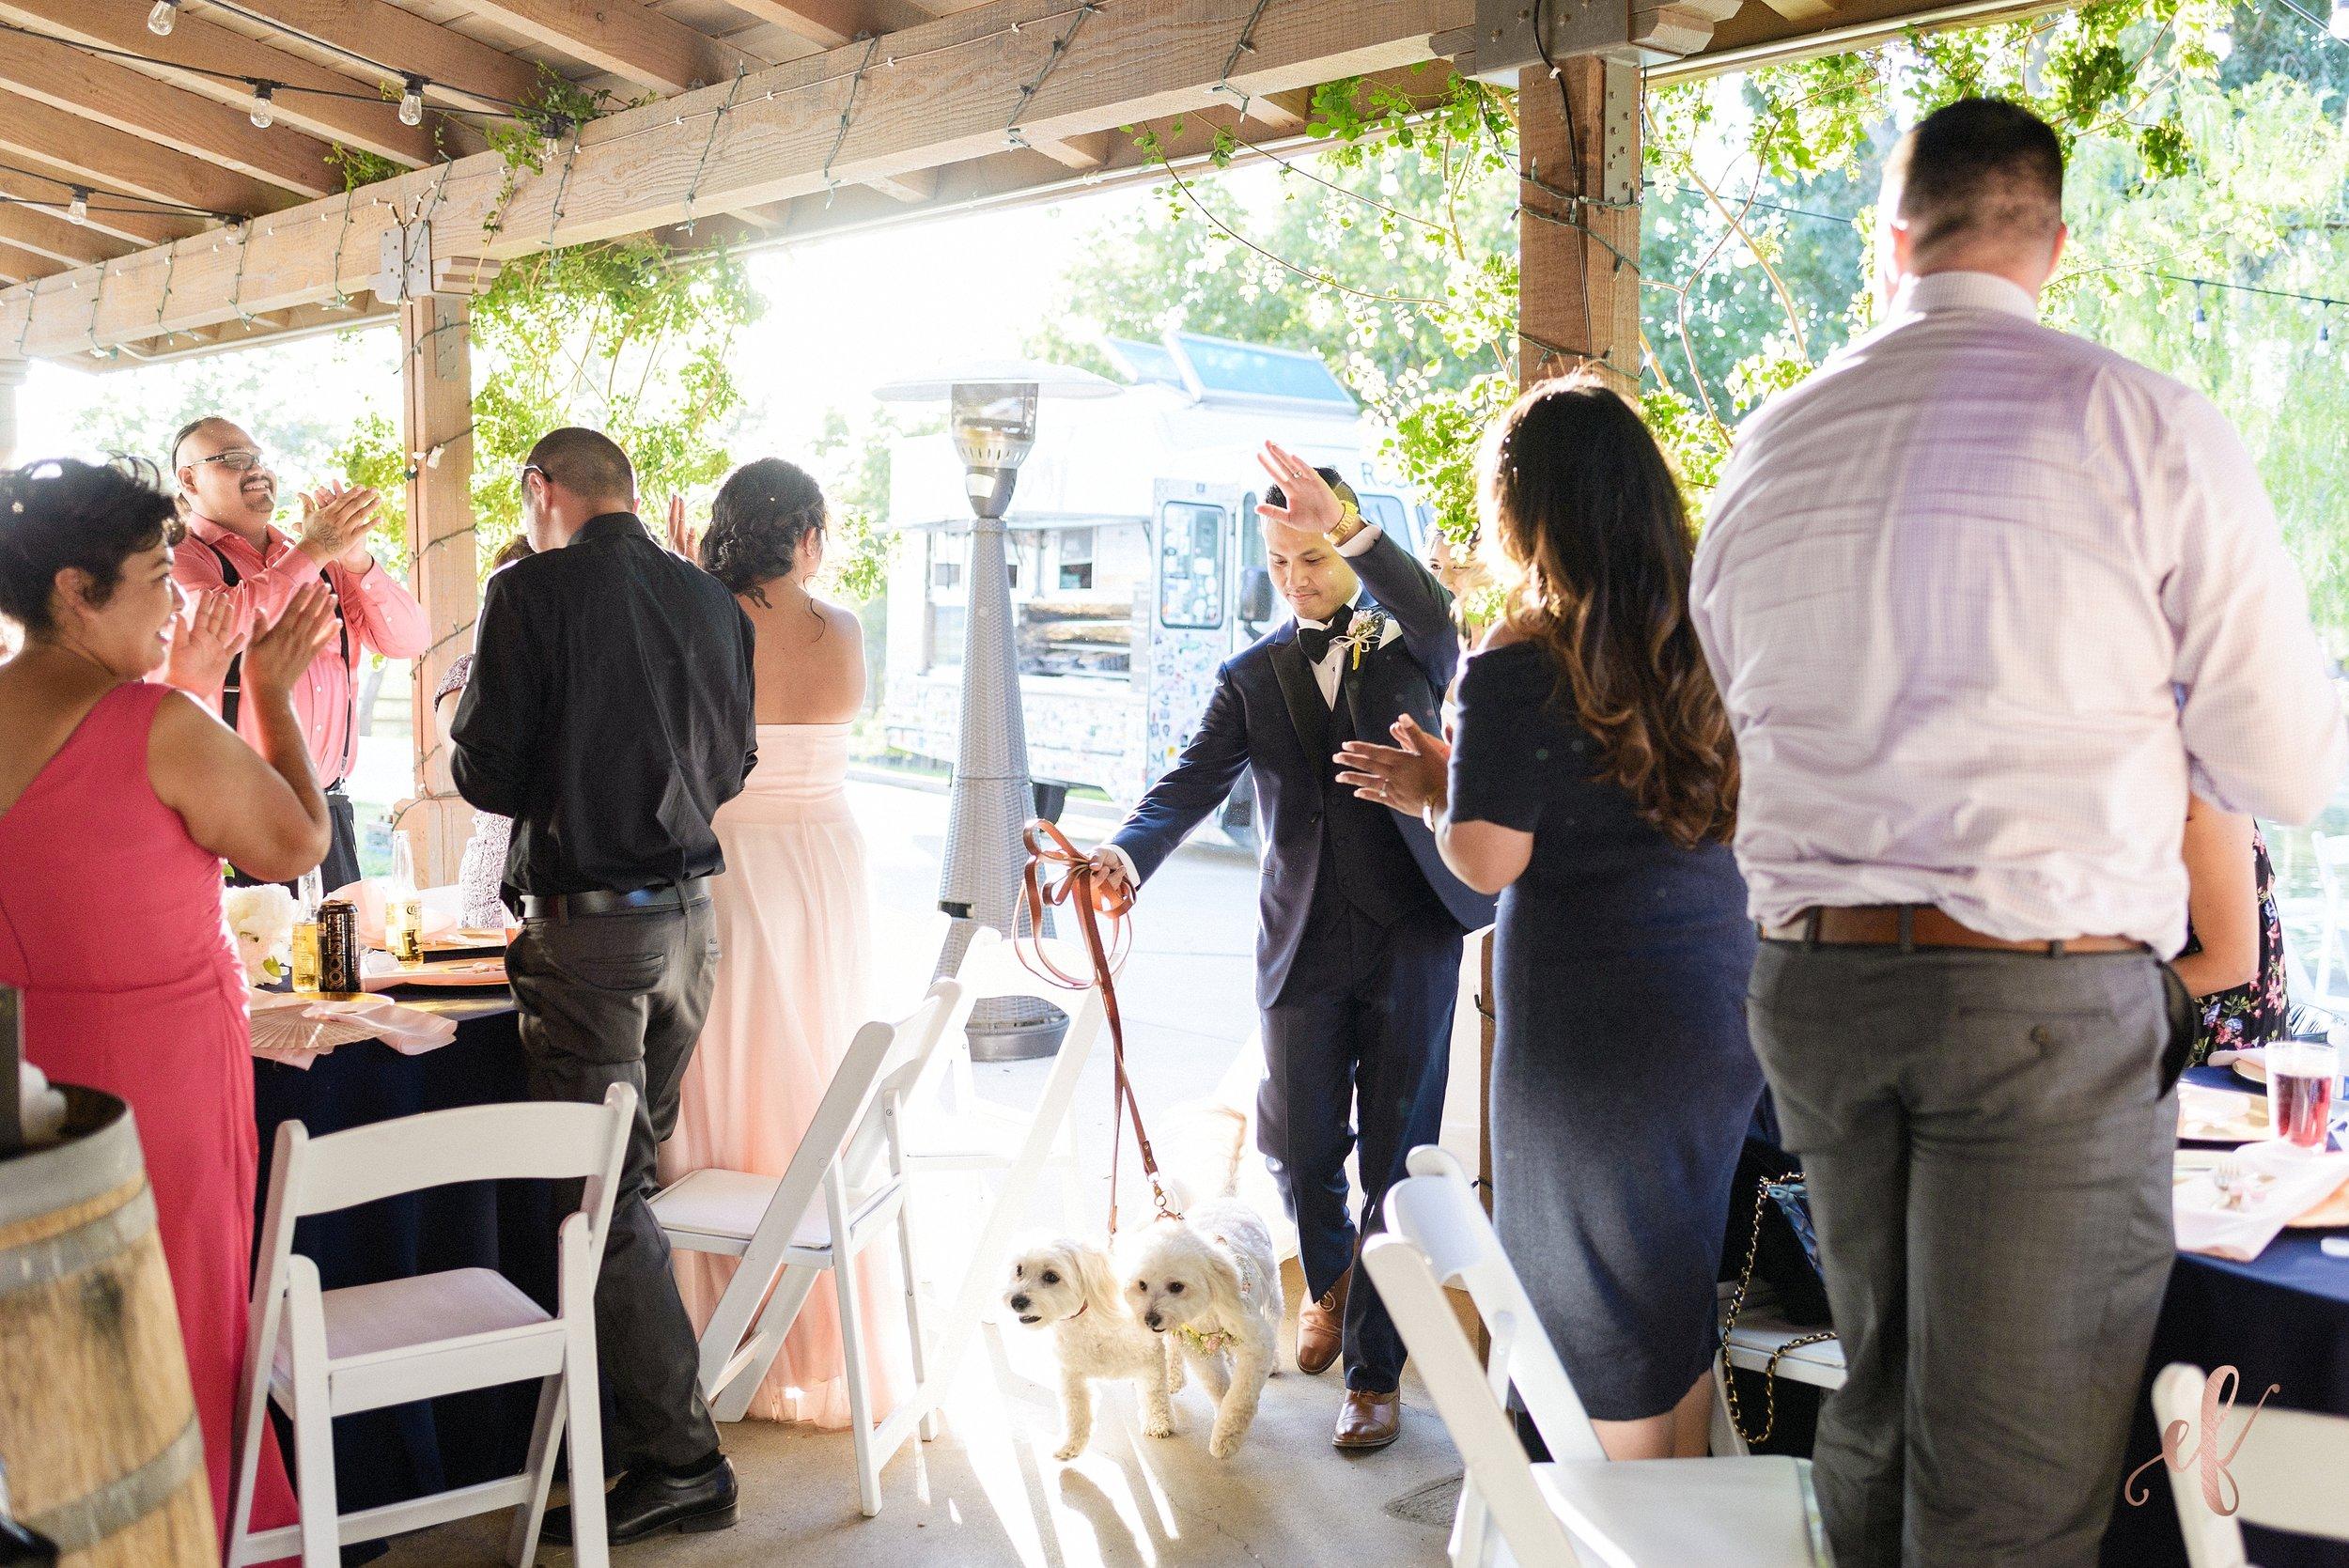 San Diego Wedding Photography | Temecula Coachhouse